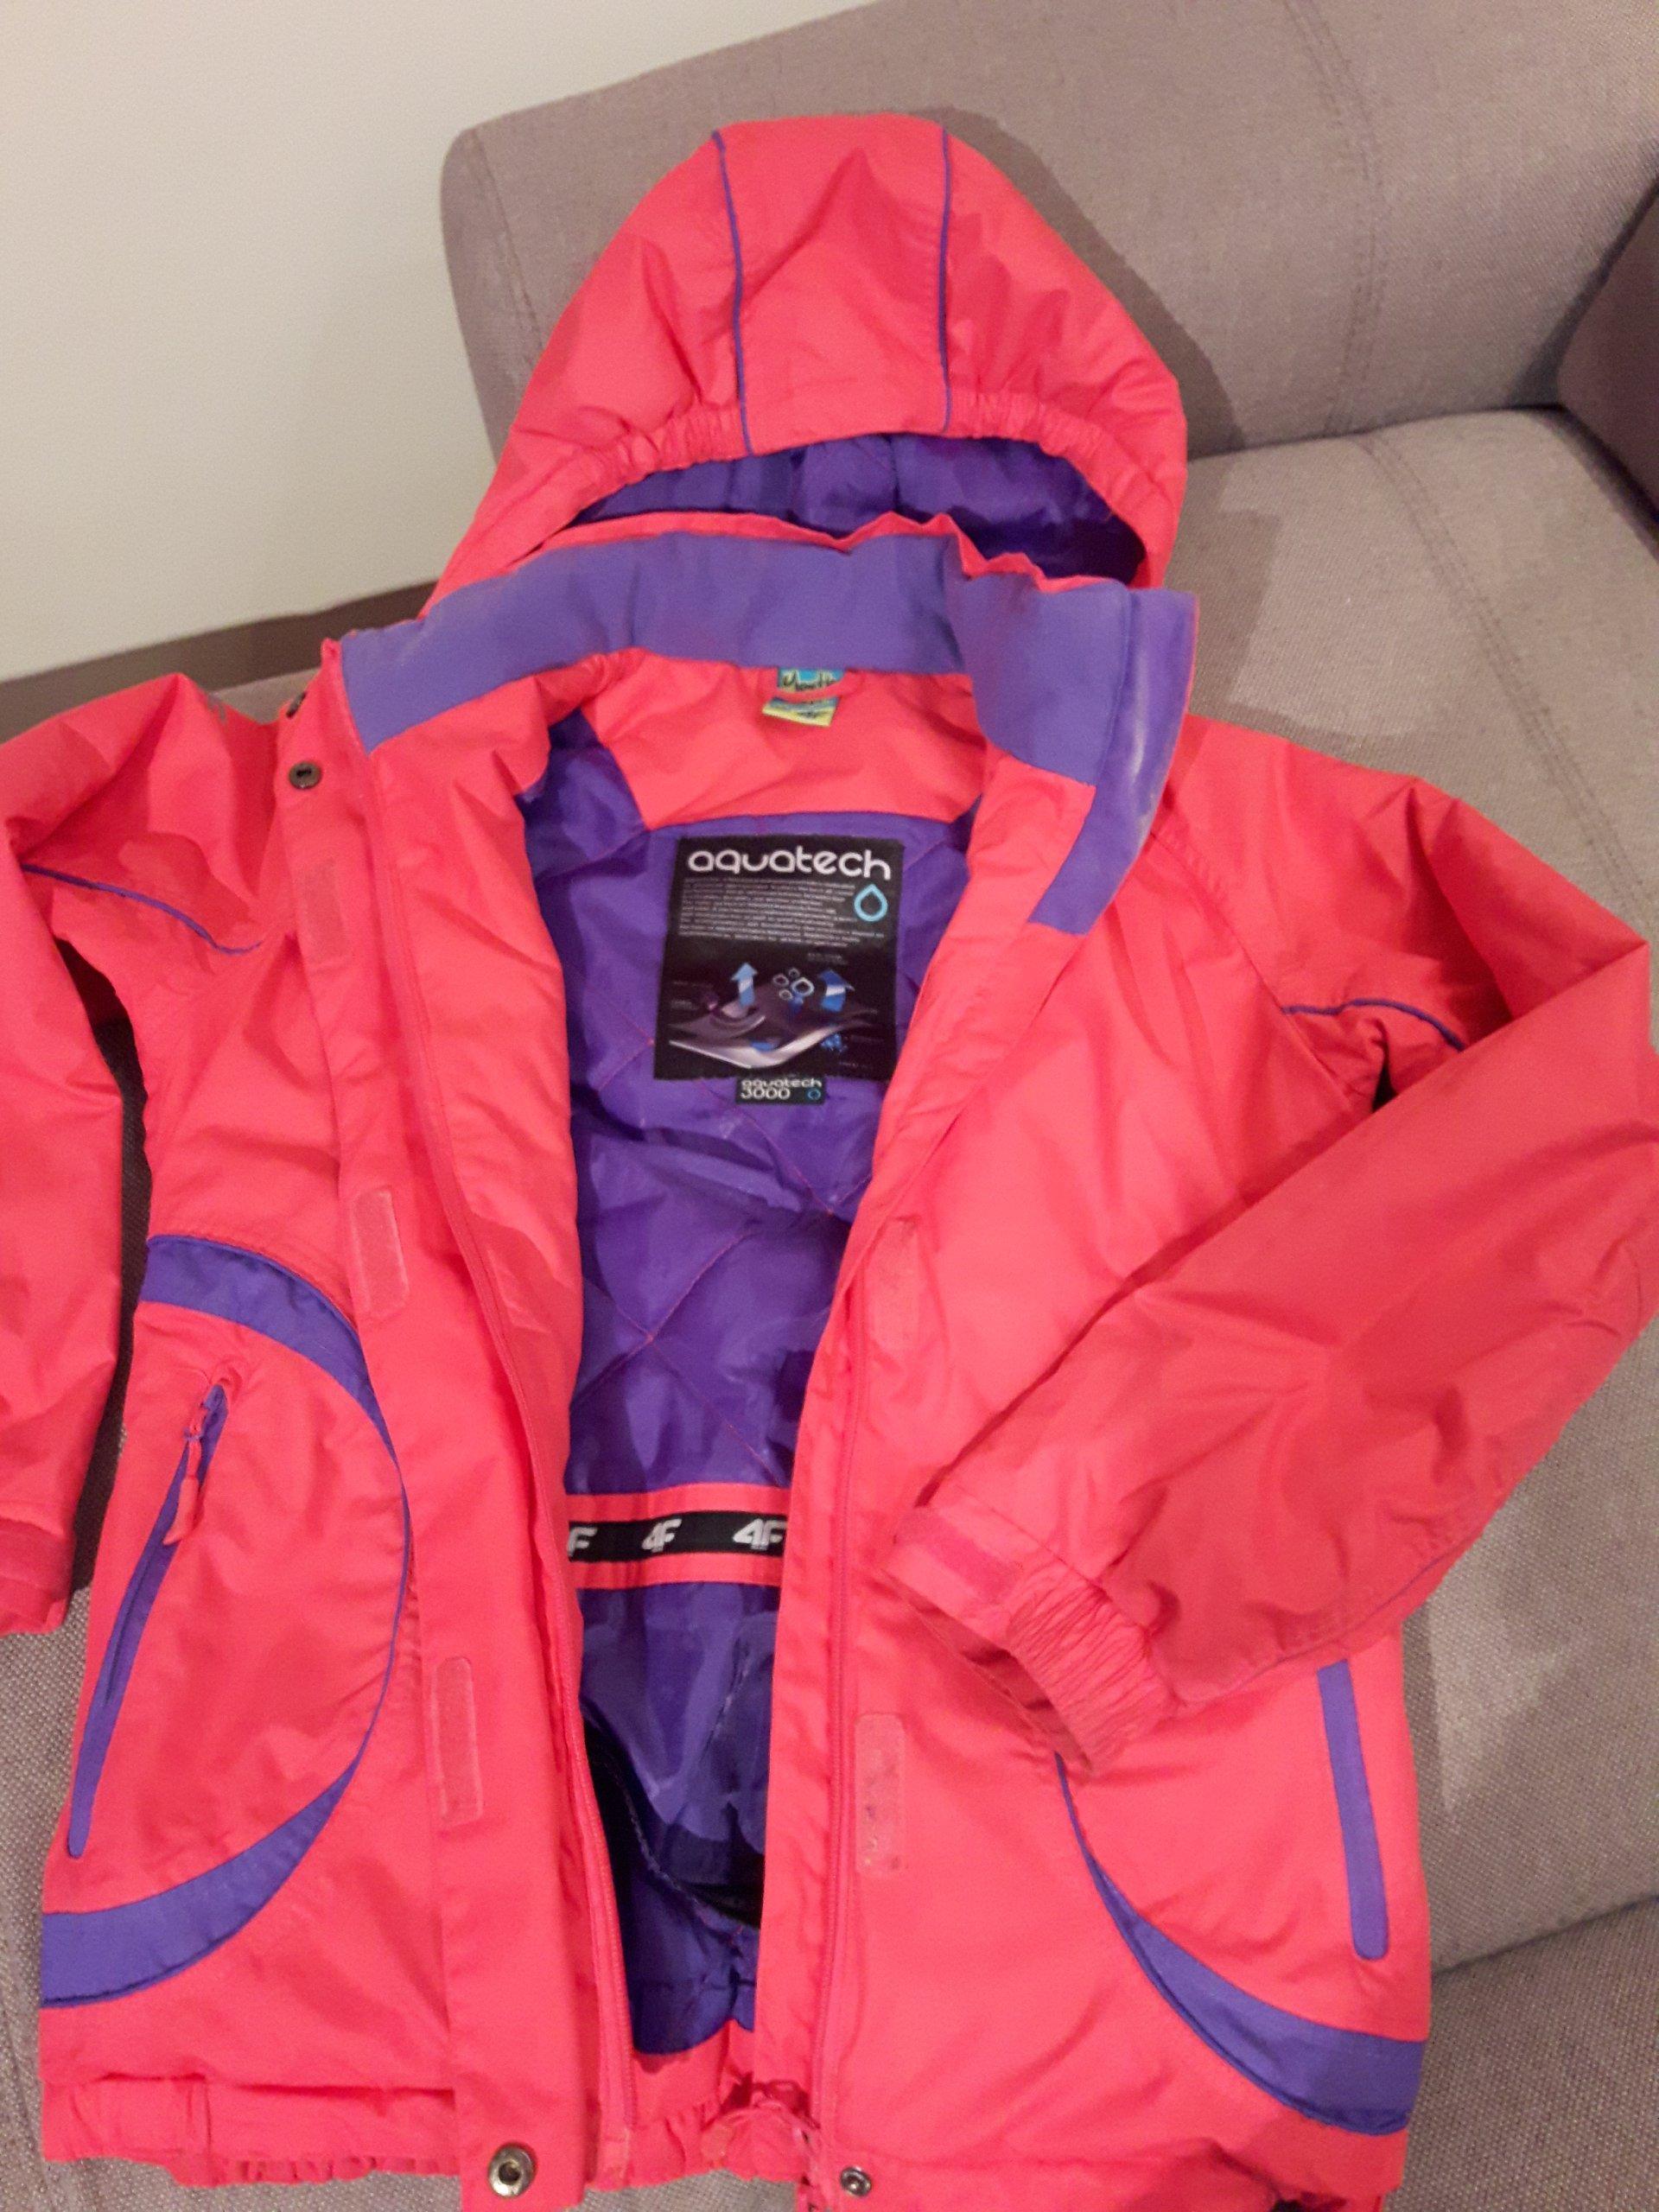 aad9ac7c7 kombinezon narciarski 4F - kurtka i spodnie - 7110834950 - oficjalne ...